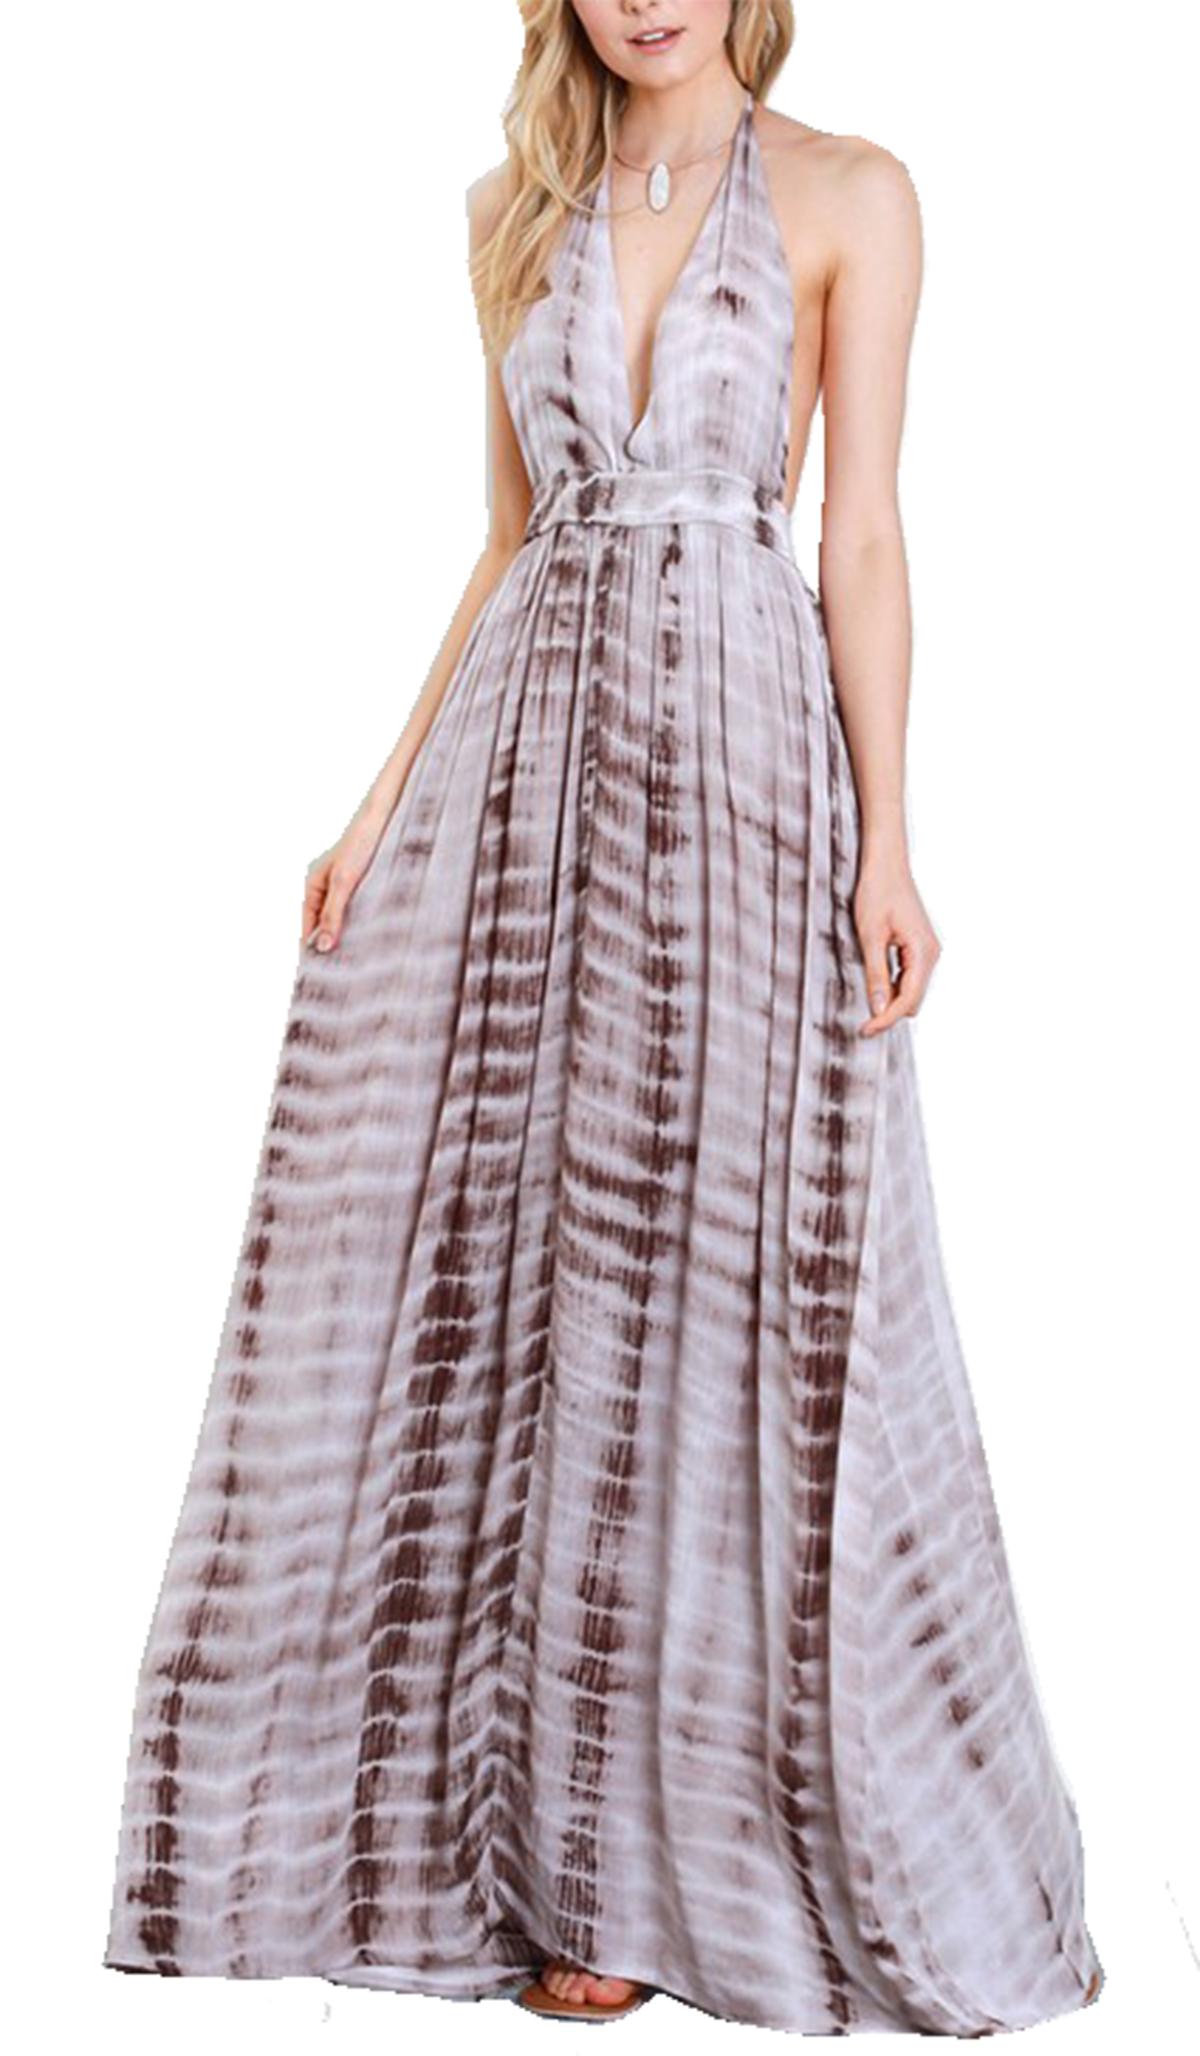 c999ddf9c0d Wishlist Womens Tie Dye Plunge Cami Maxi Dress - Trenz Shirt Company